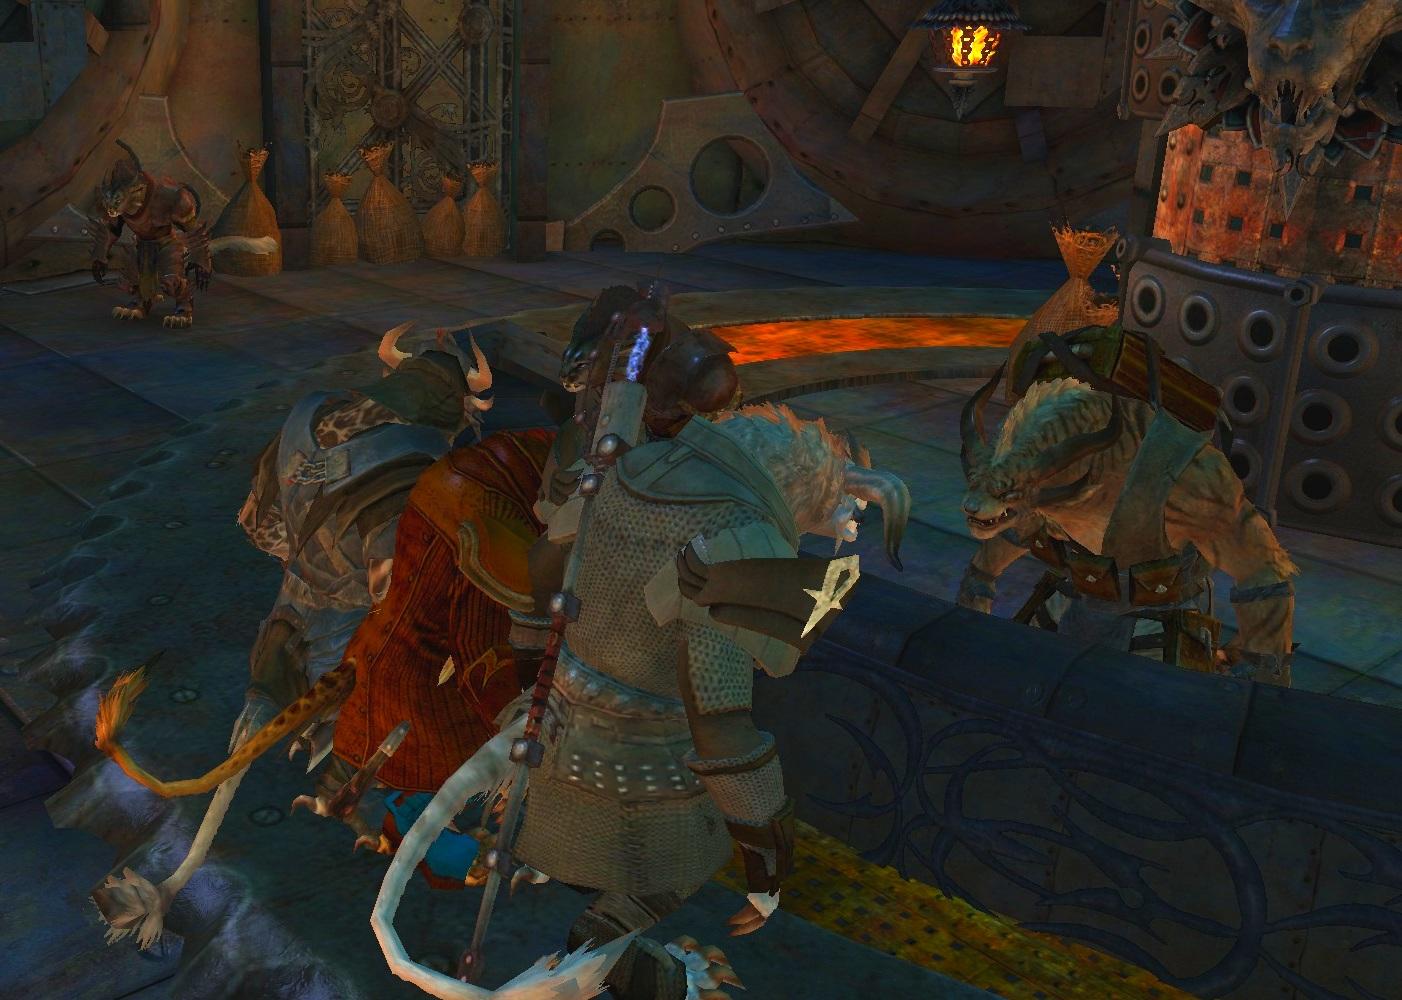 Guild wars 2 gw2 darkened desires gw2 fashion - Gw2 Less Than A Week Into Guild Wars 2